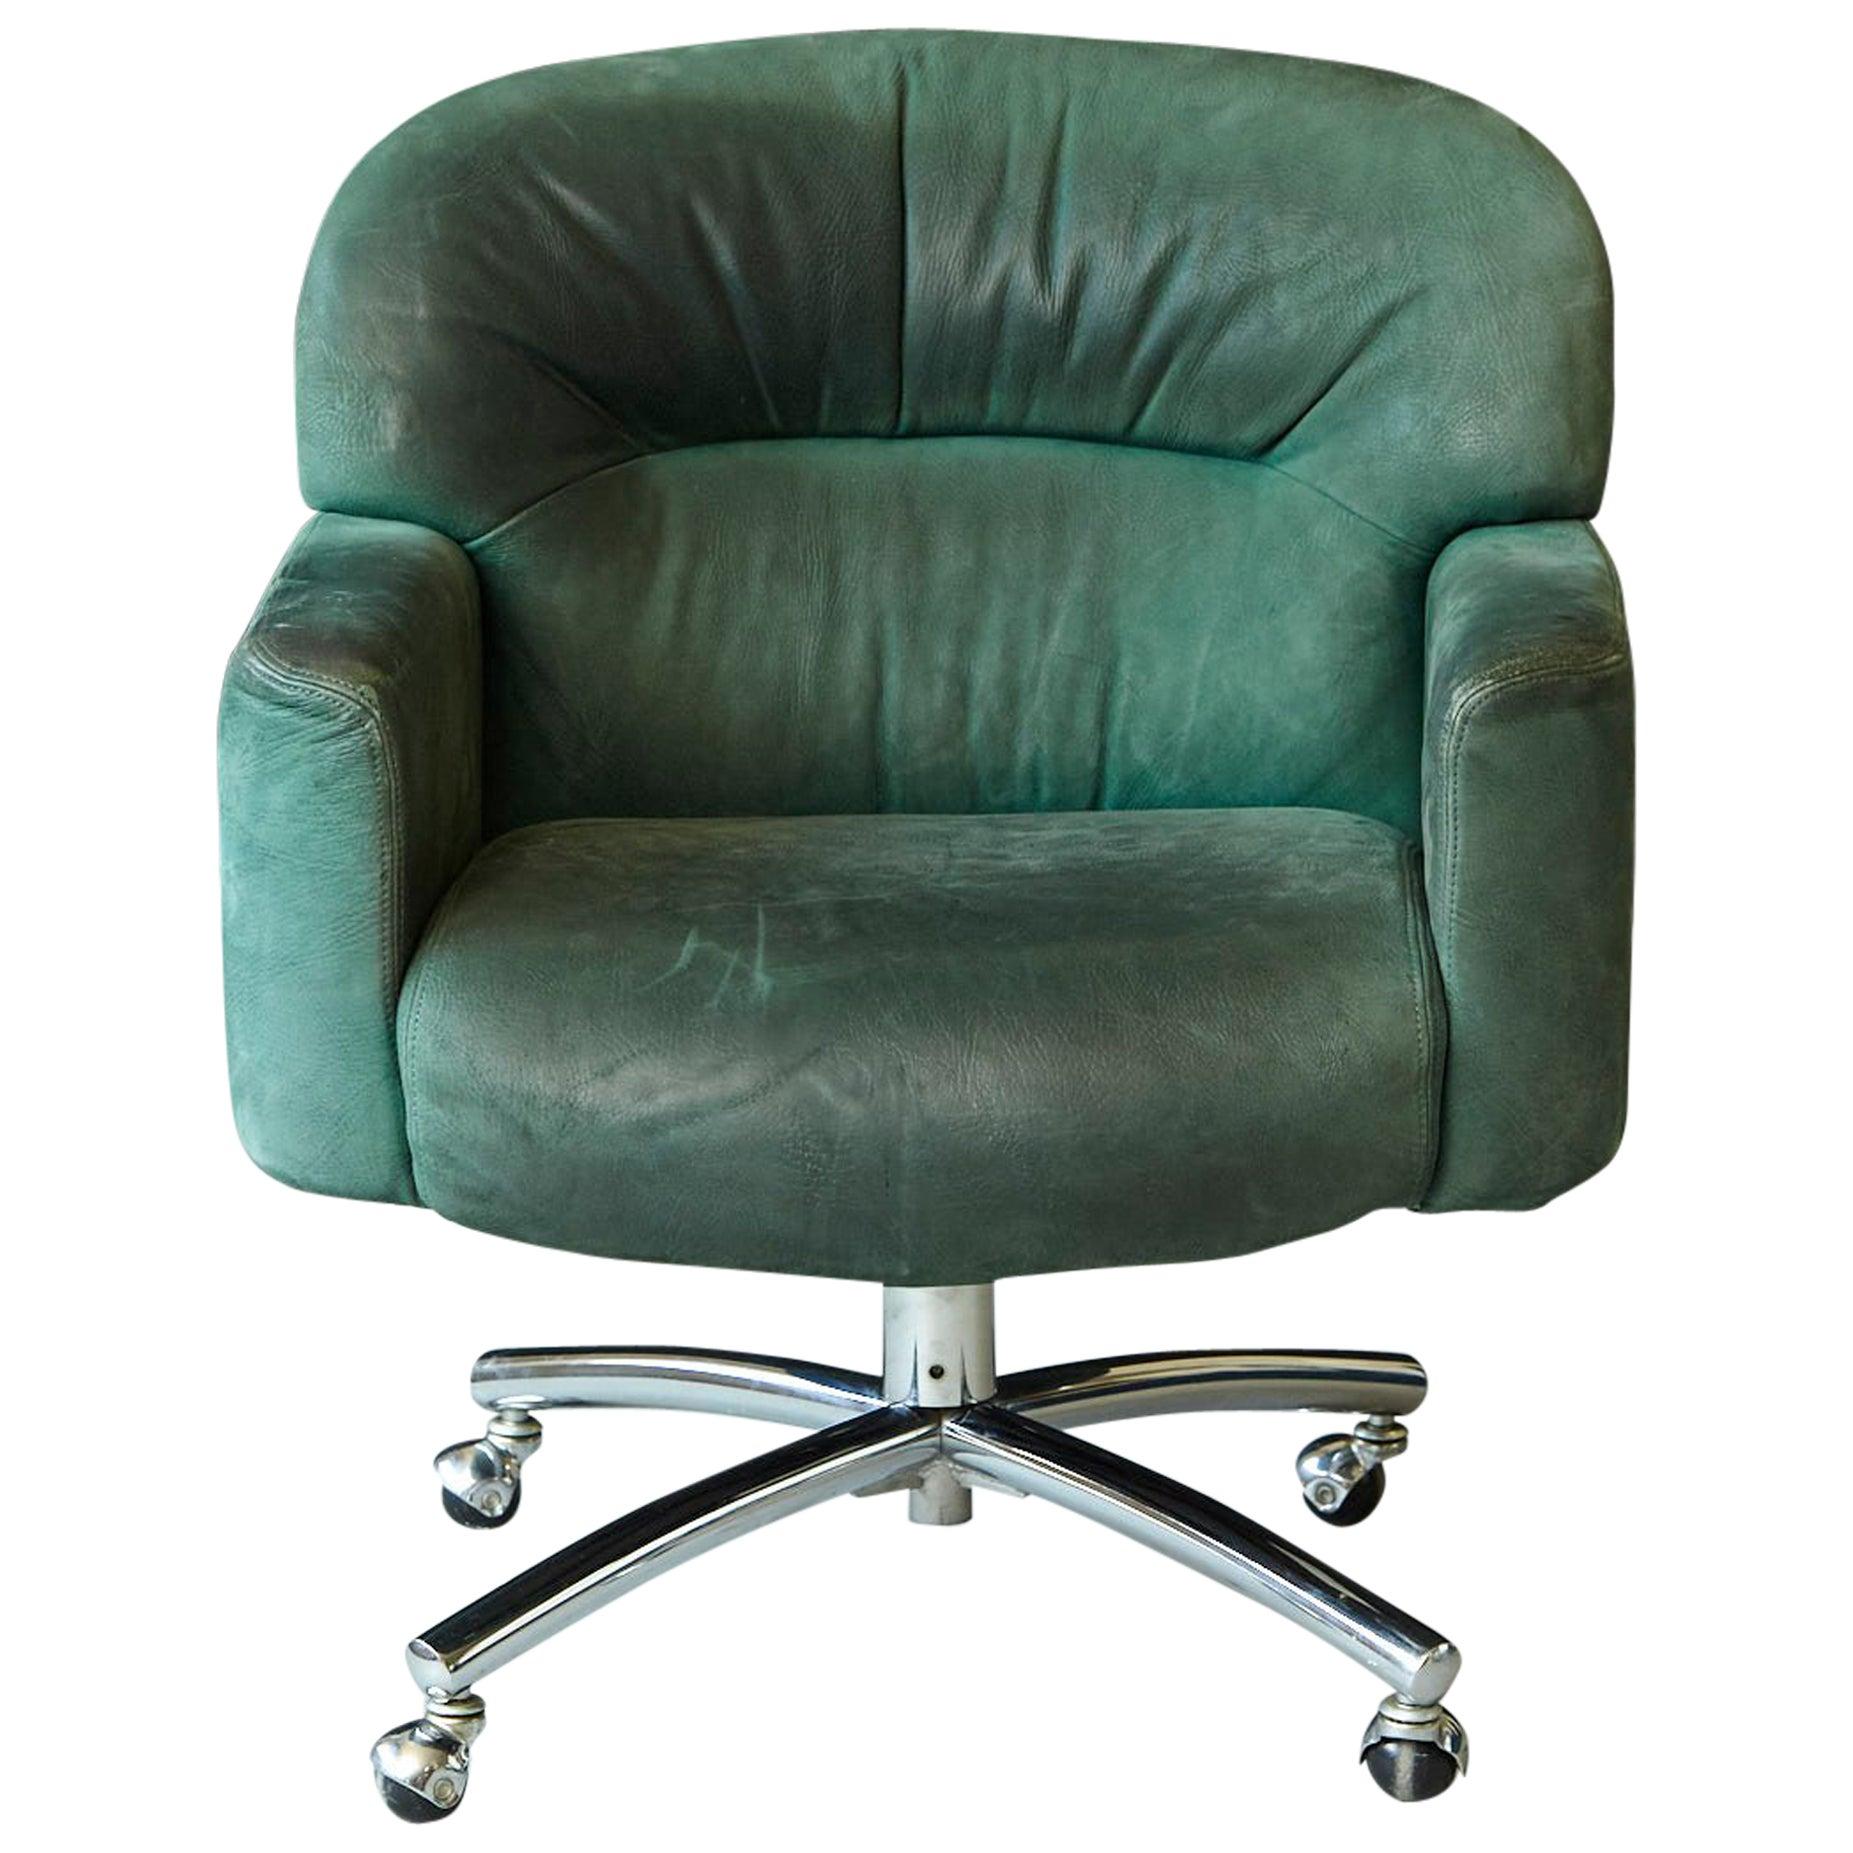 Ideal 1920s Solid Oak Office Armchair by W.H. Gunlocke Chair Co at 1stdibs XX18